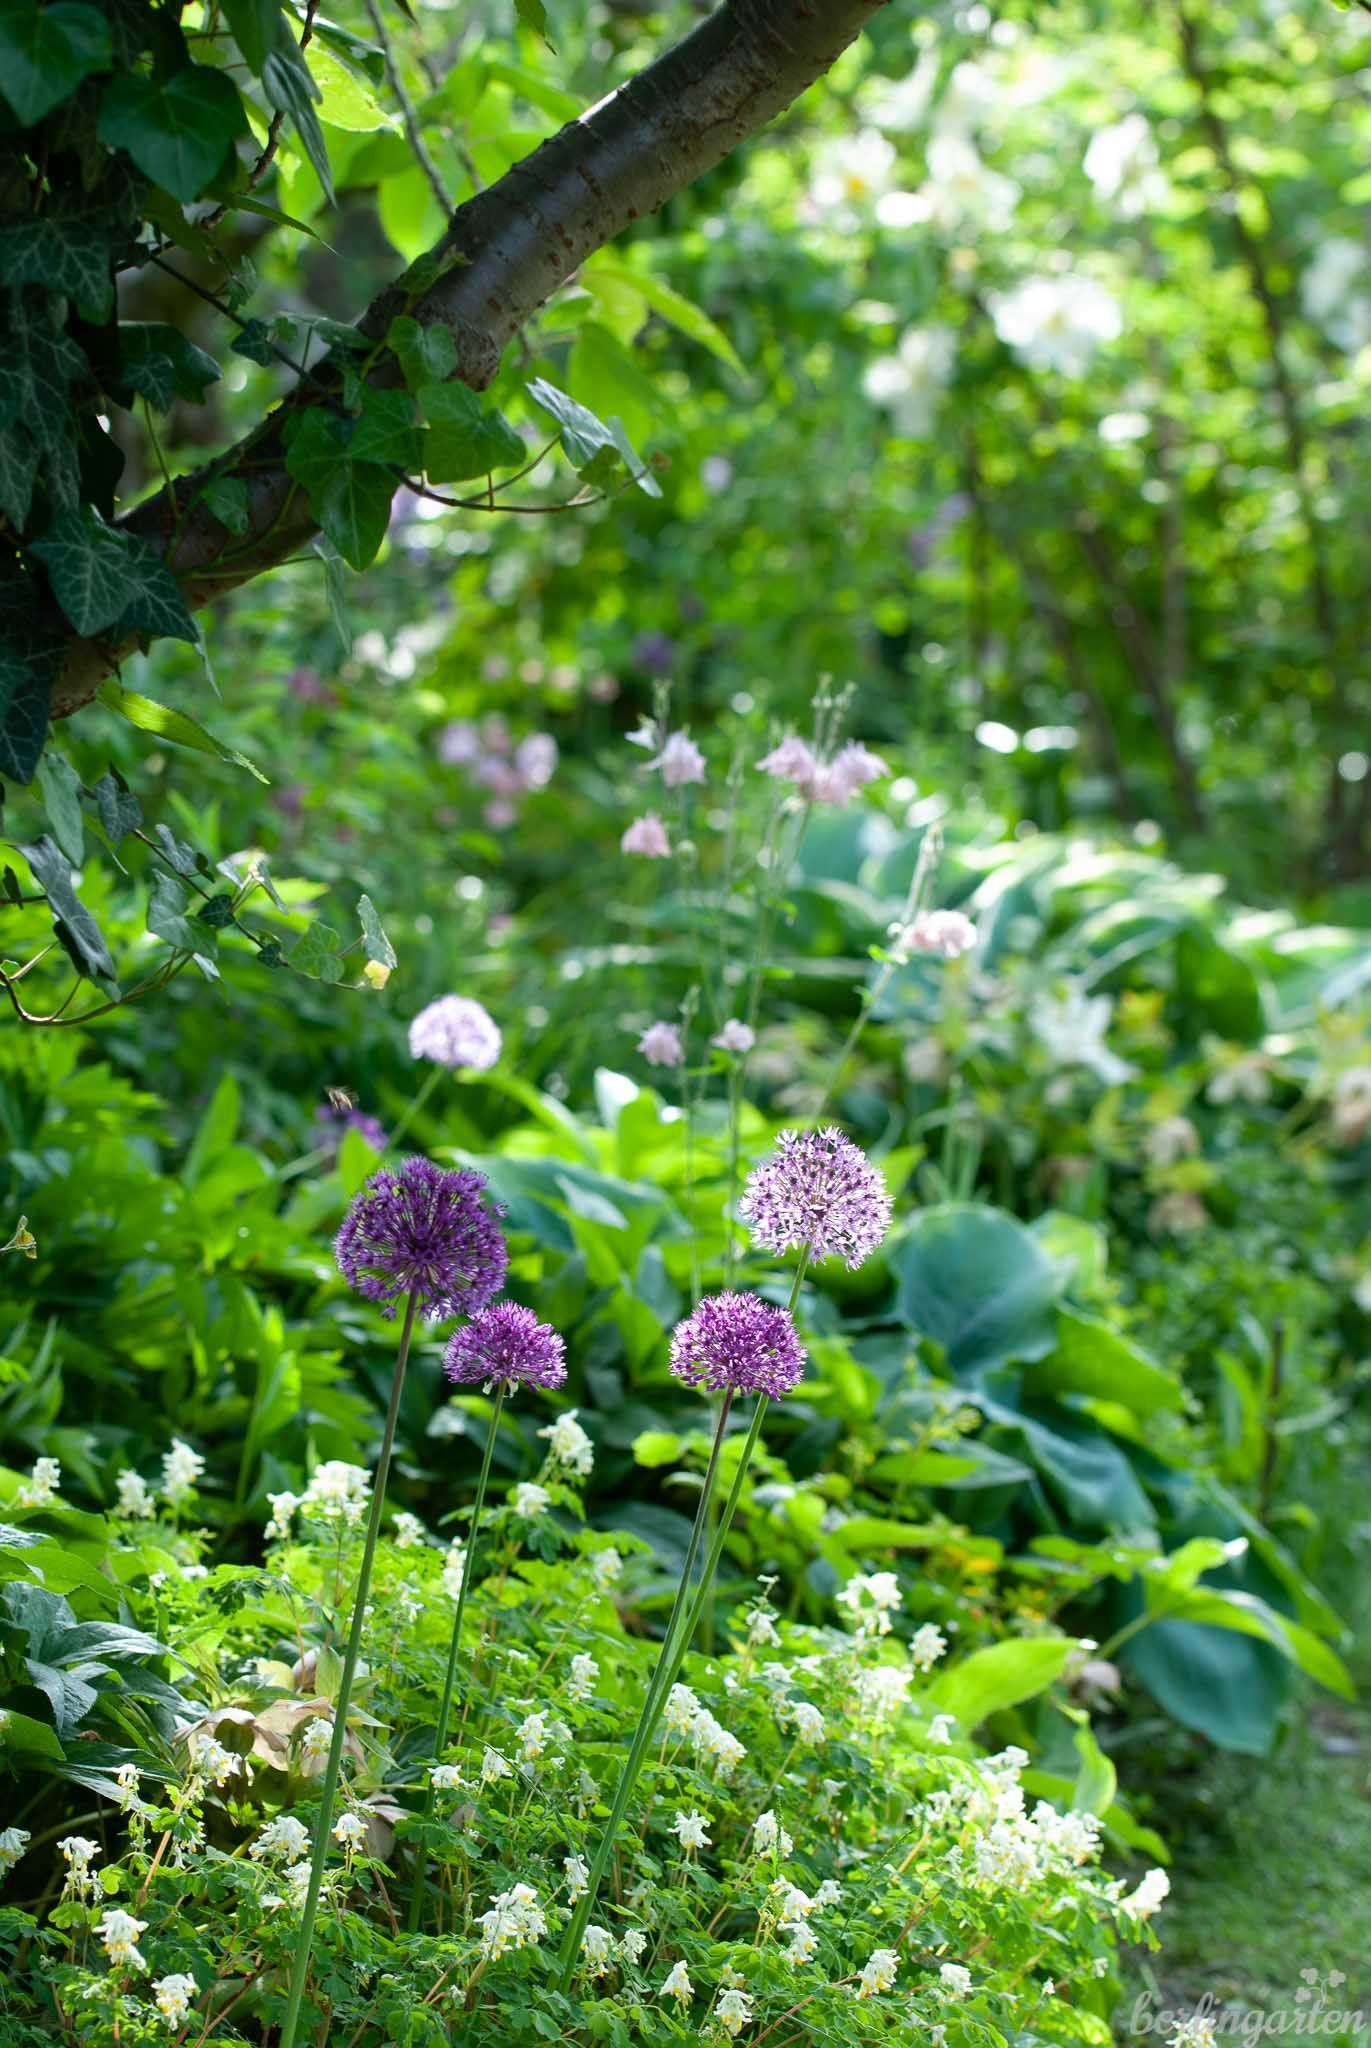 Mit Blattstrukturen Gestalten Lieblingsfarbe Grun Berlingarten In 2020 Pflanzen Garten Schattengarten